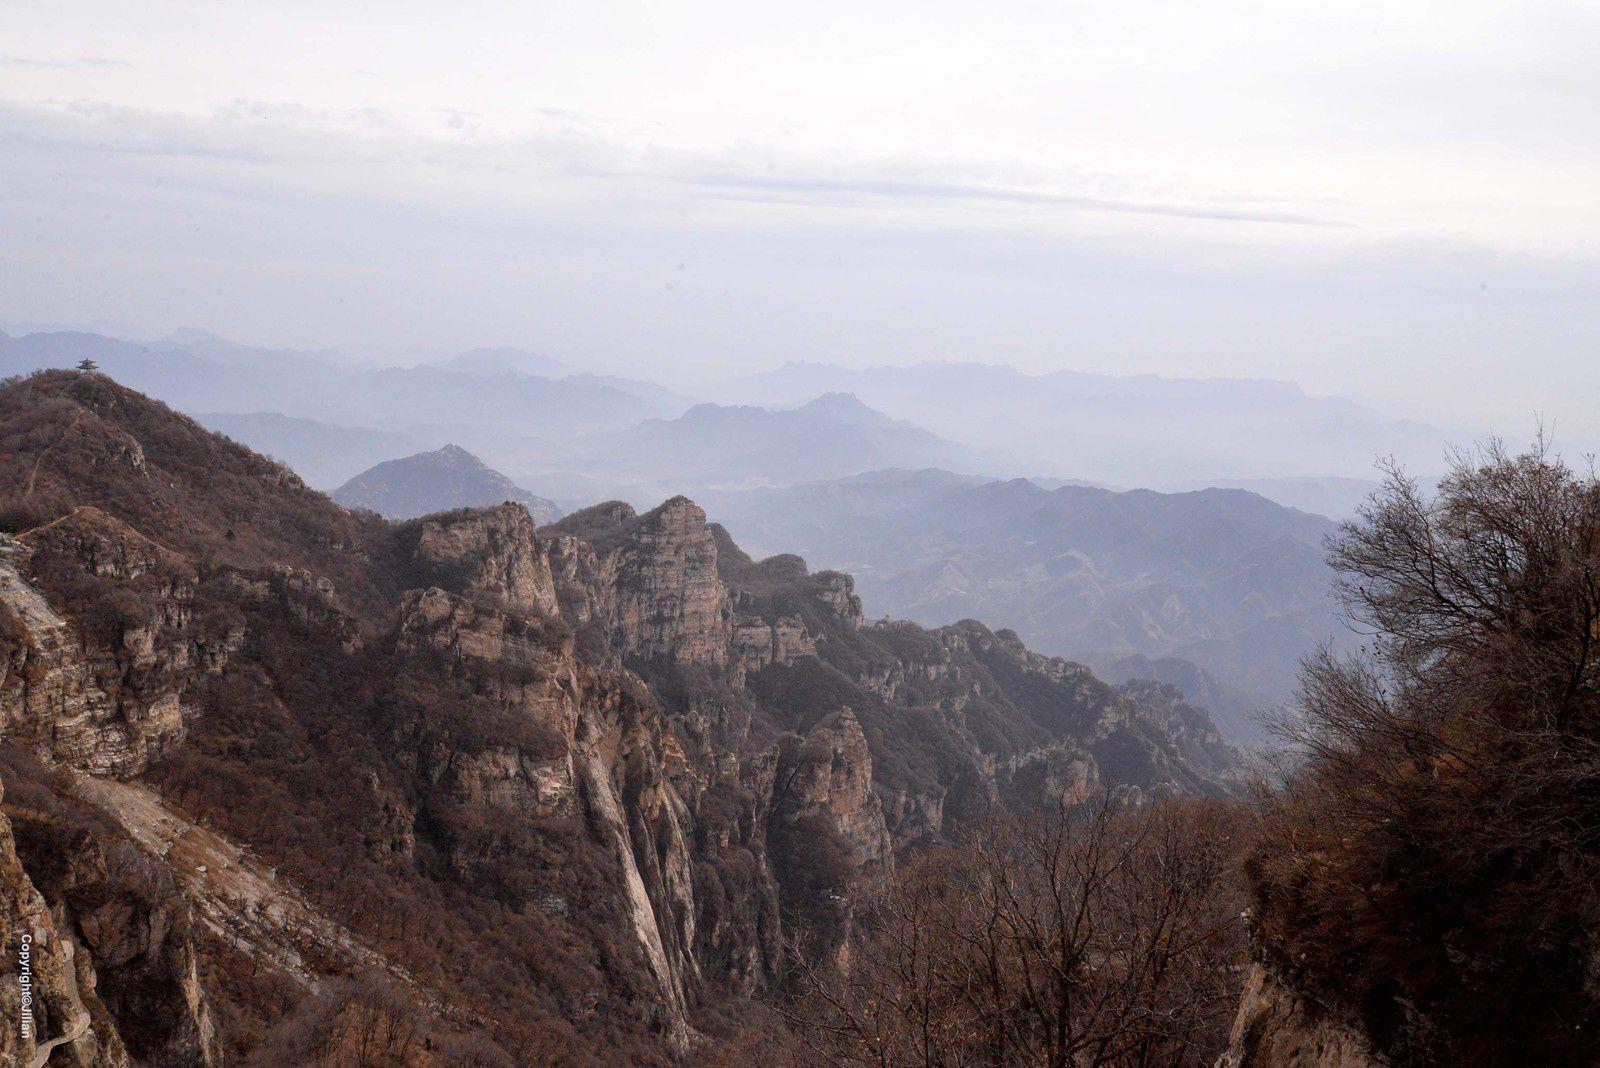 White Stone Mountain - 白石山 (Baishishan)